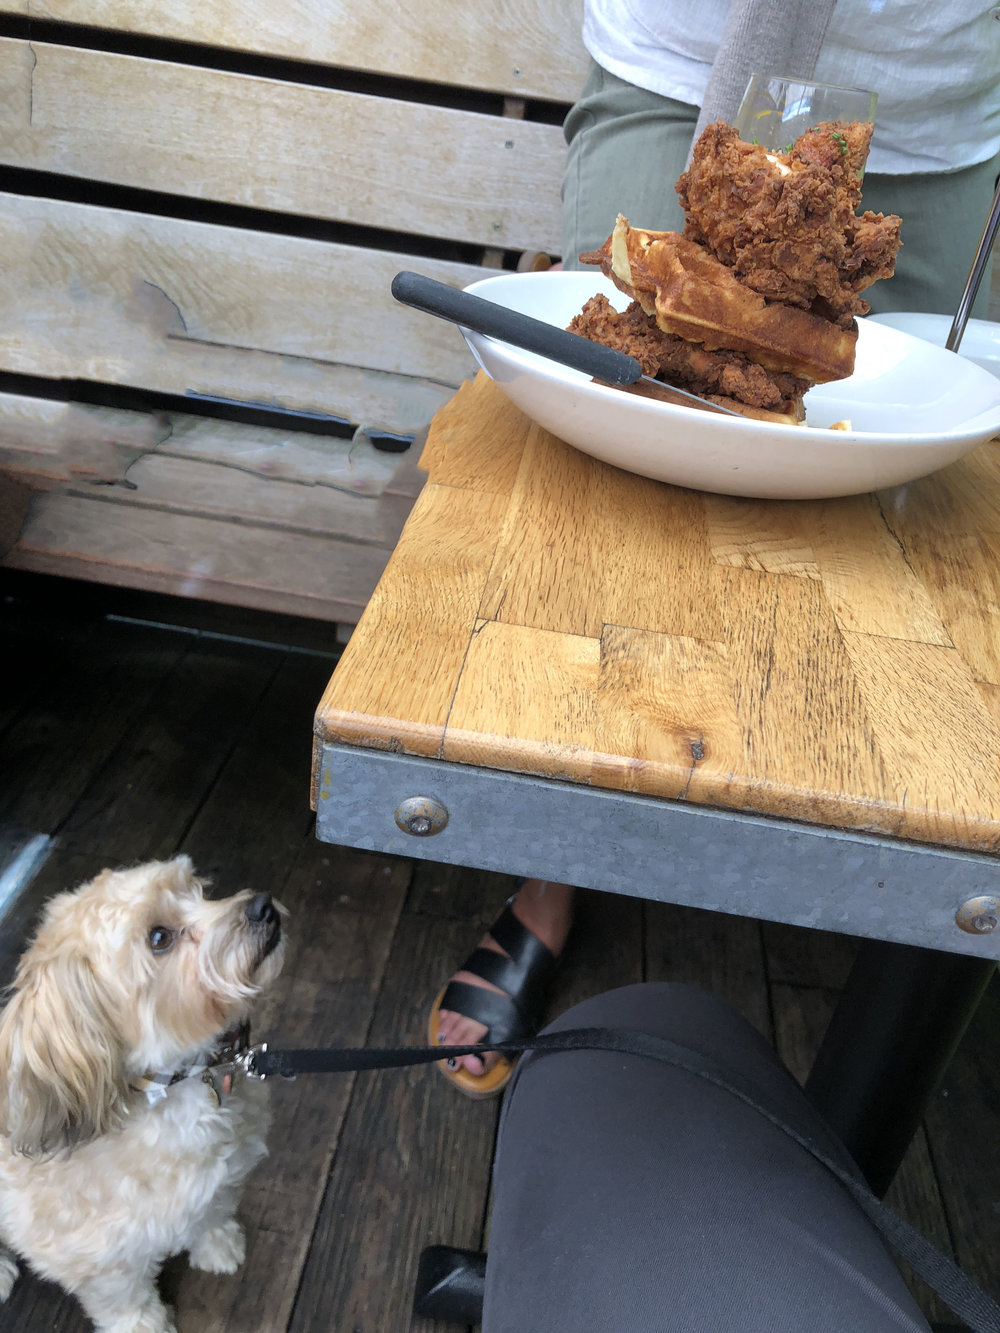 Furbaby scheming on how to reach that chicken!